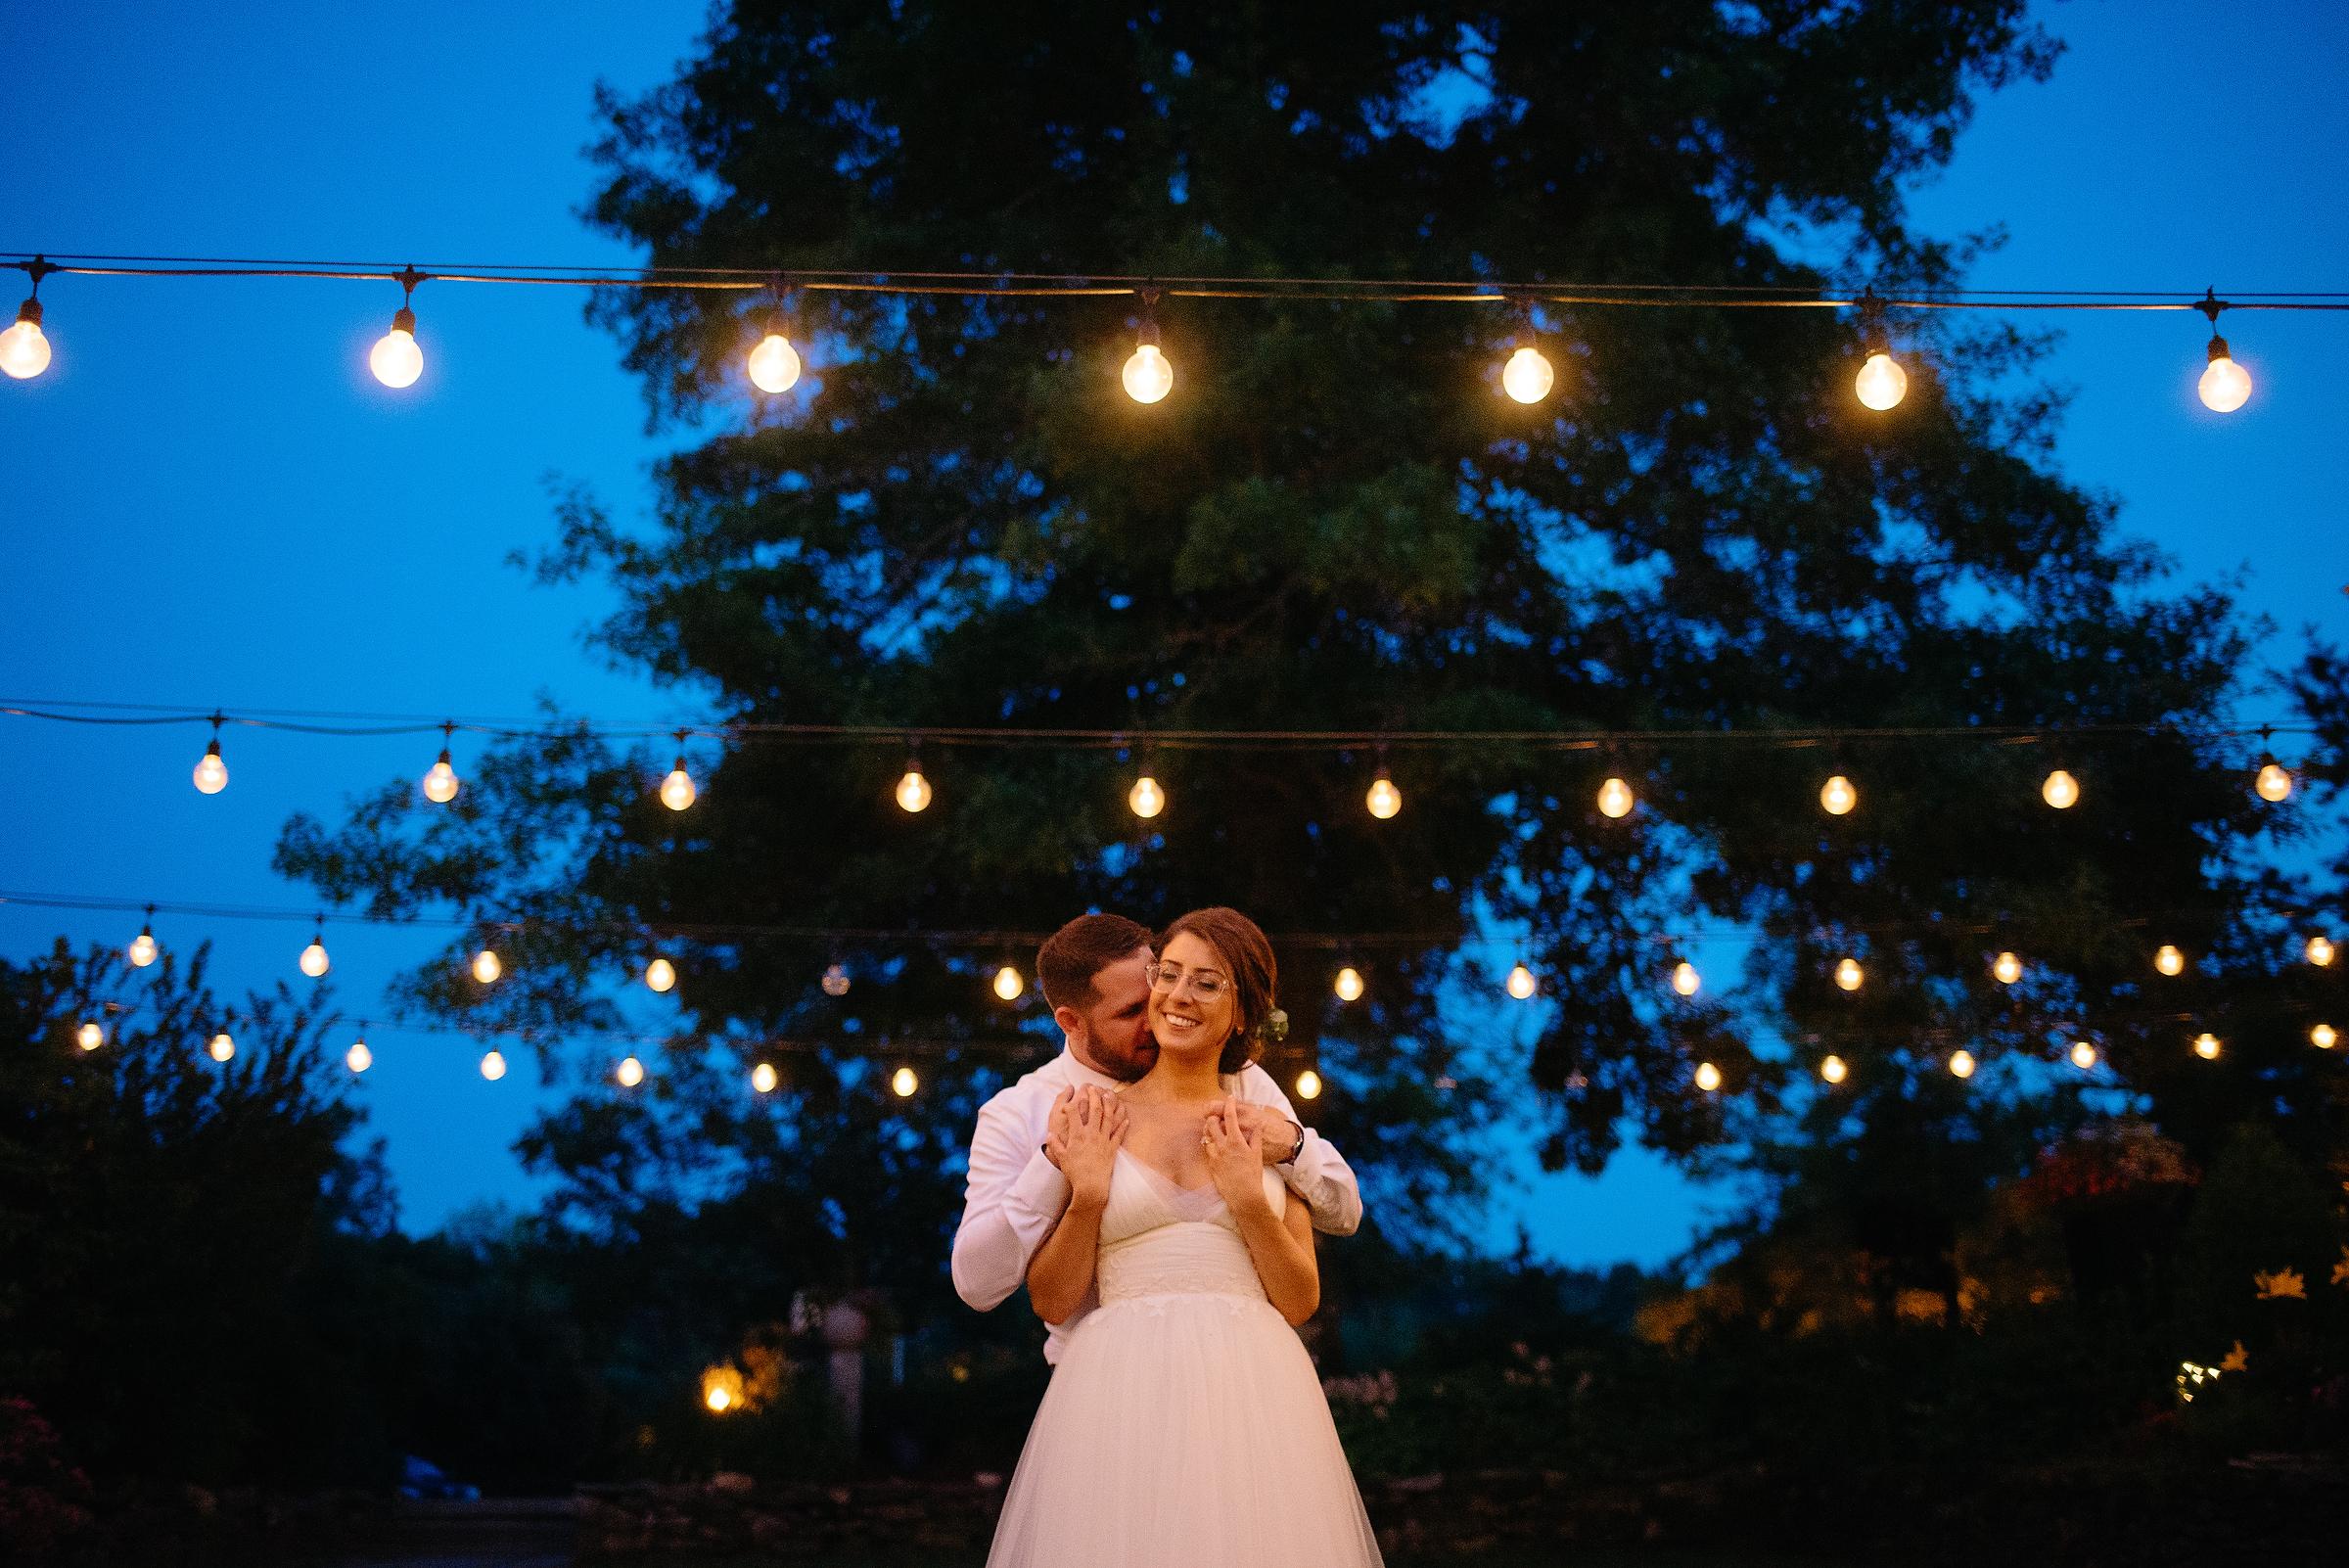 night wedding photos at bedford village inn